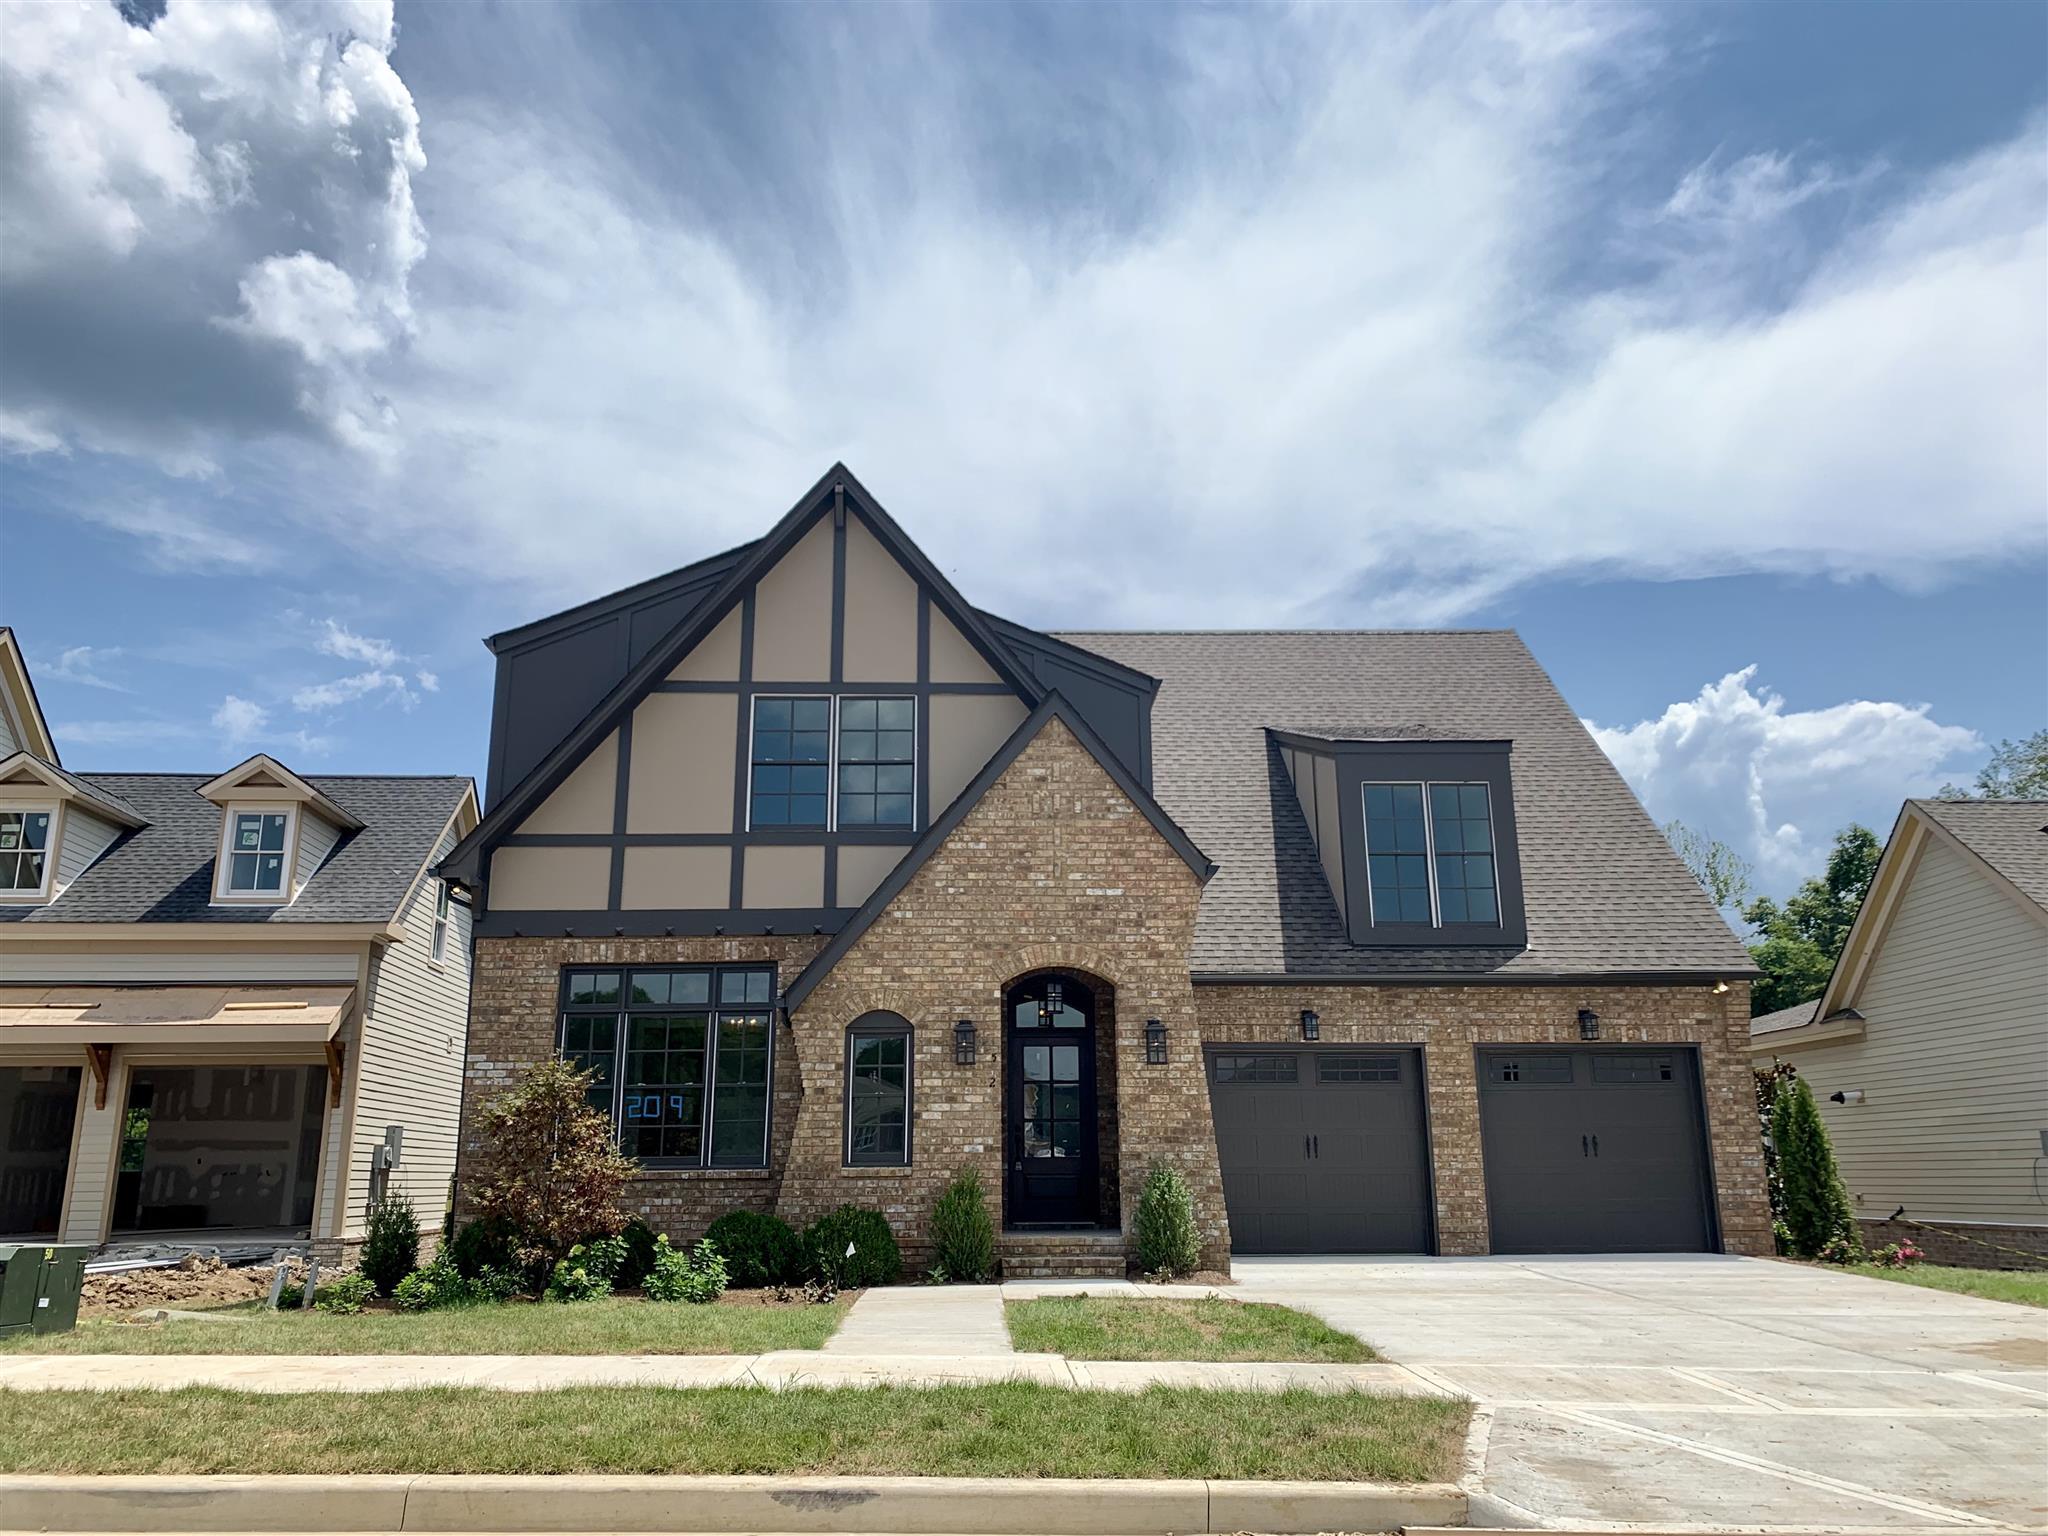 52 Glenrock Drive, Nashville, TN 37221 - Nashville, TN real estate listing